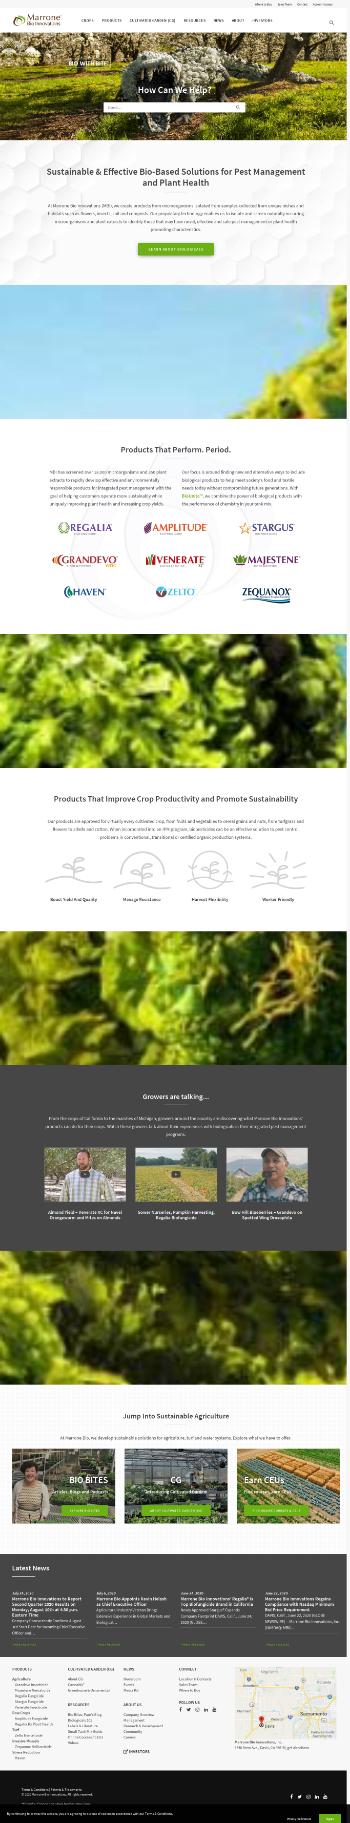 Marrone Bio Innovations, Inc. Website Screenshot